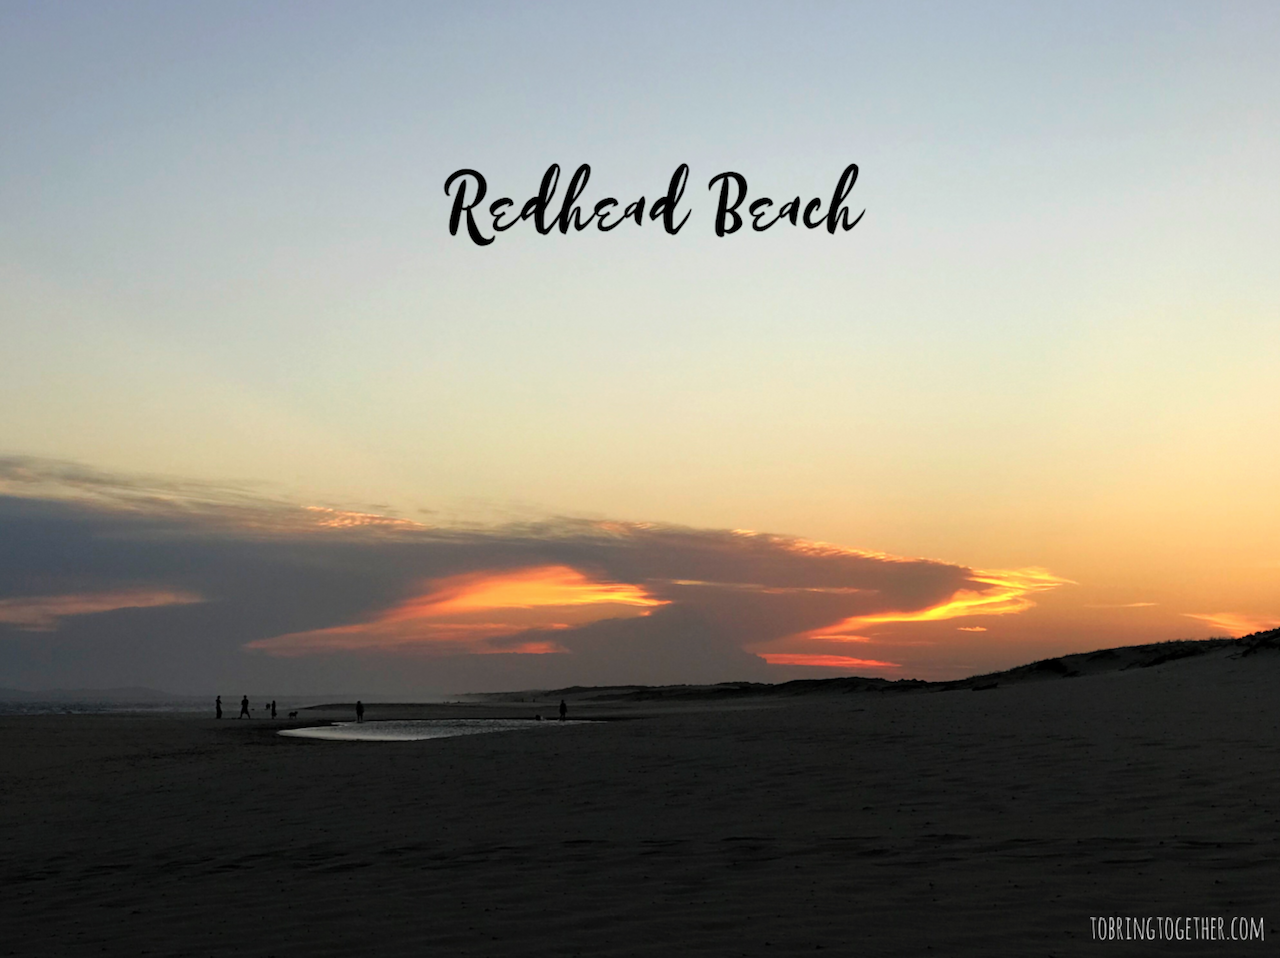 Redhead Beach NSW, 2019